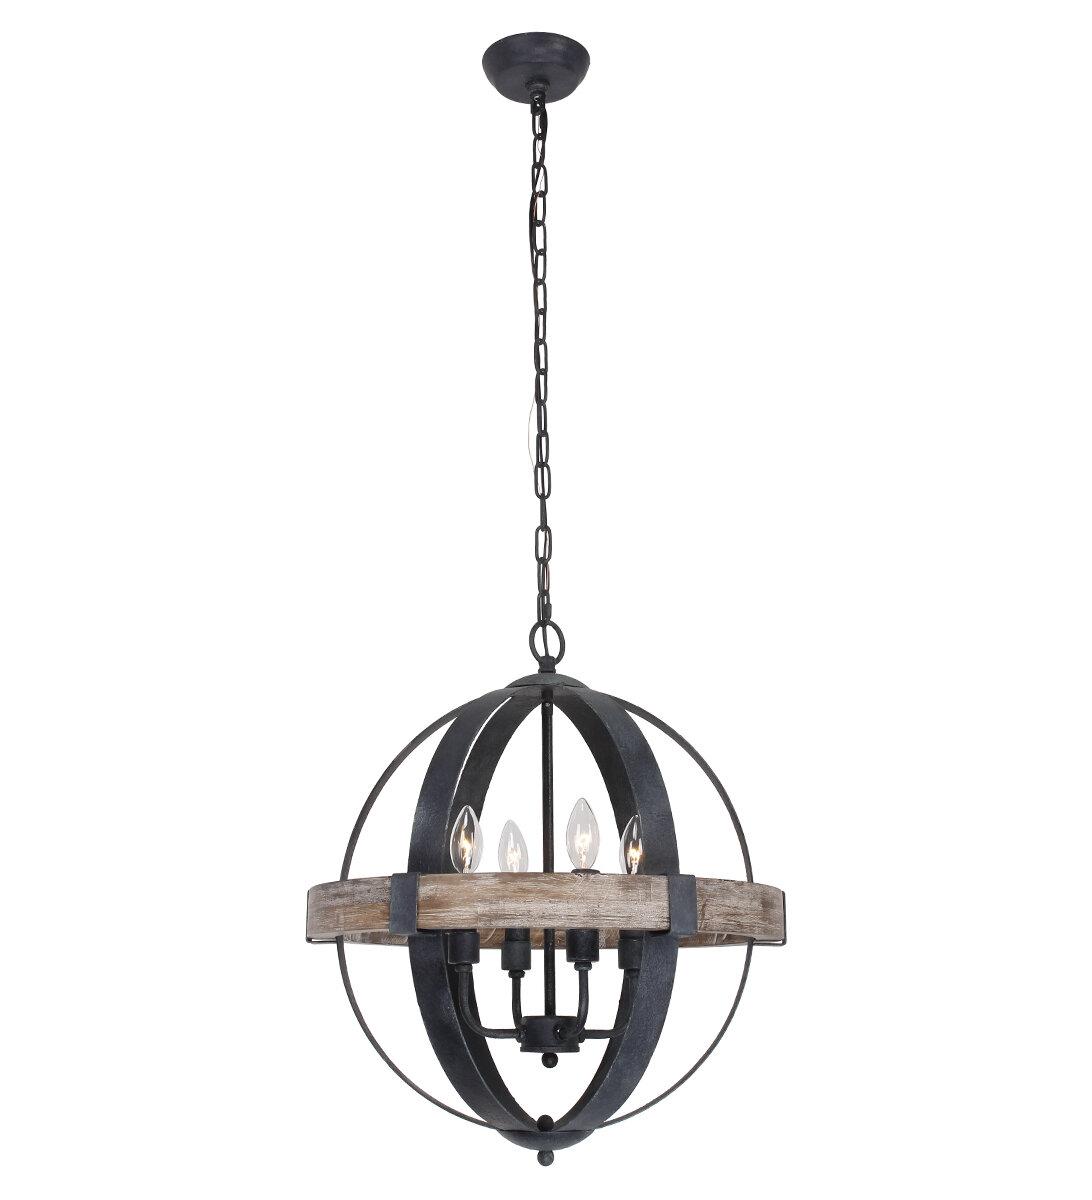 Hillsboro 4 Light Globe Chandelier Throughout La Sarre 3 Light Globe Chandeliers (View 18 of 30)